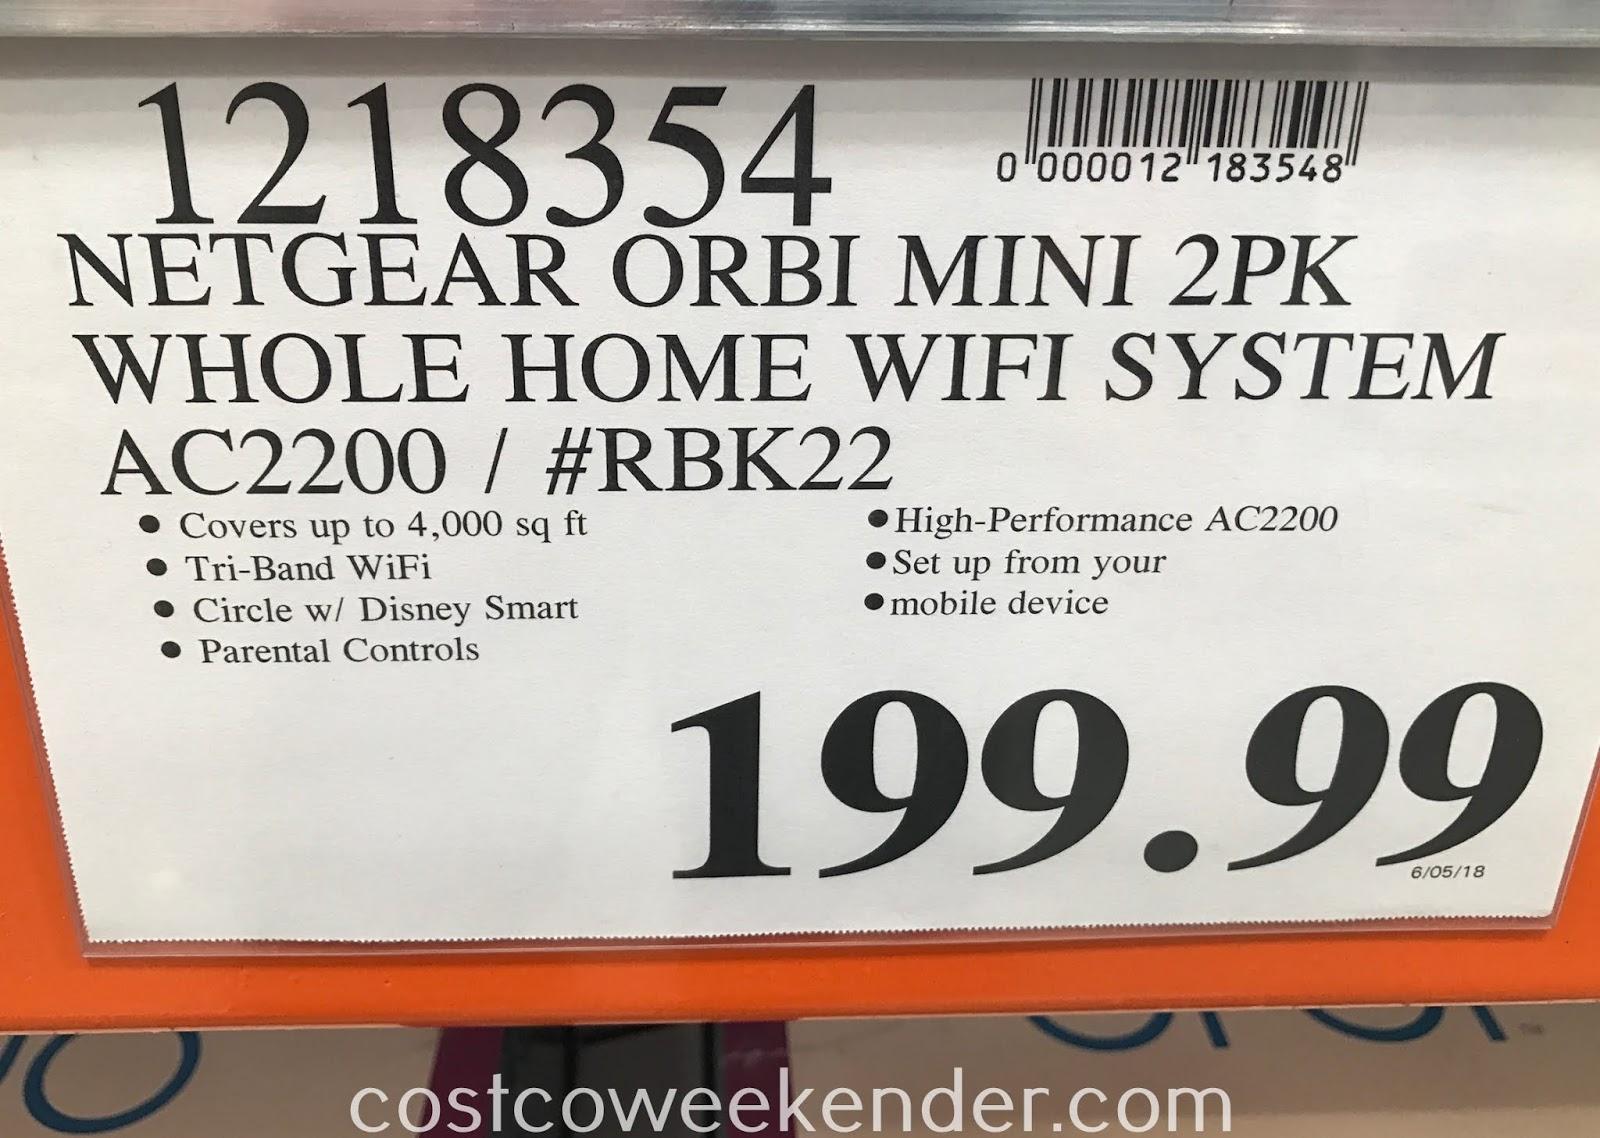 Netgear Orbi WiFi System AC2200 (RBK22) (2 pack) | Costco